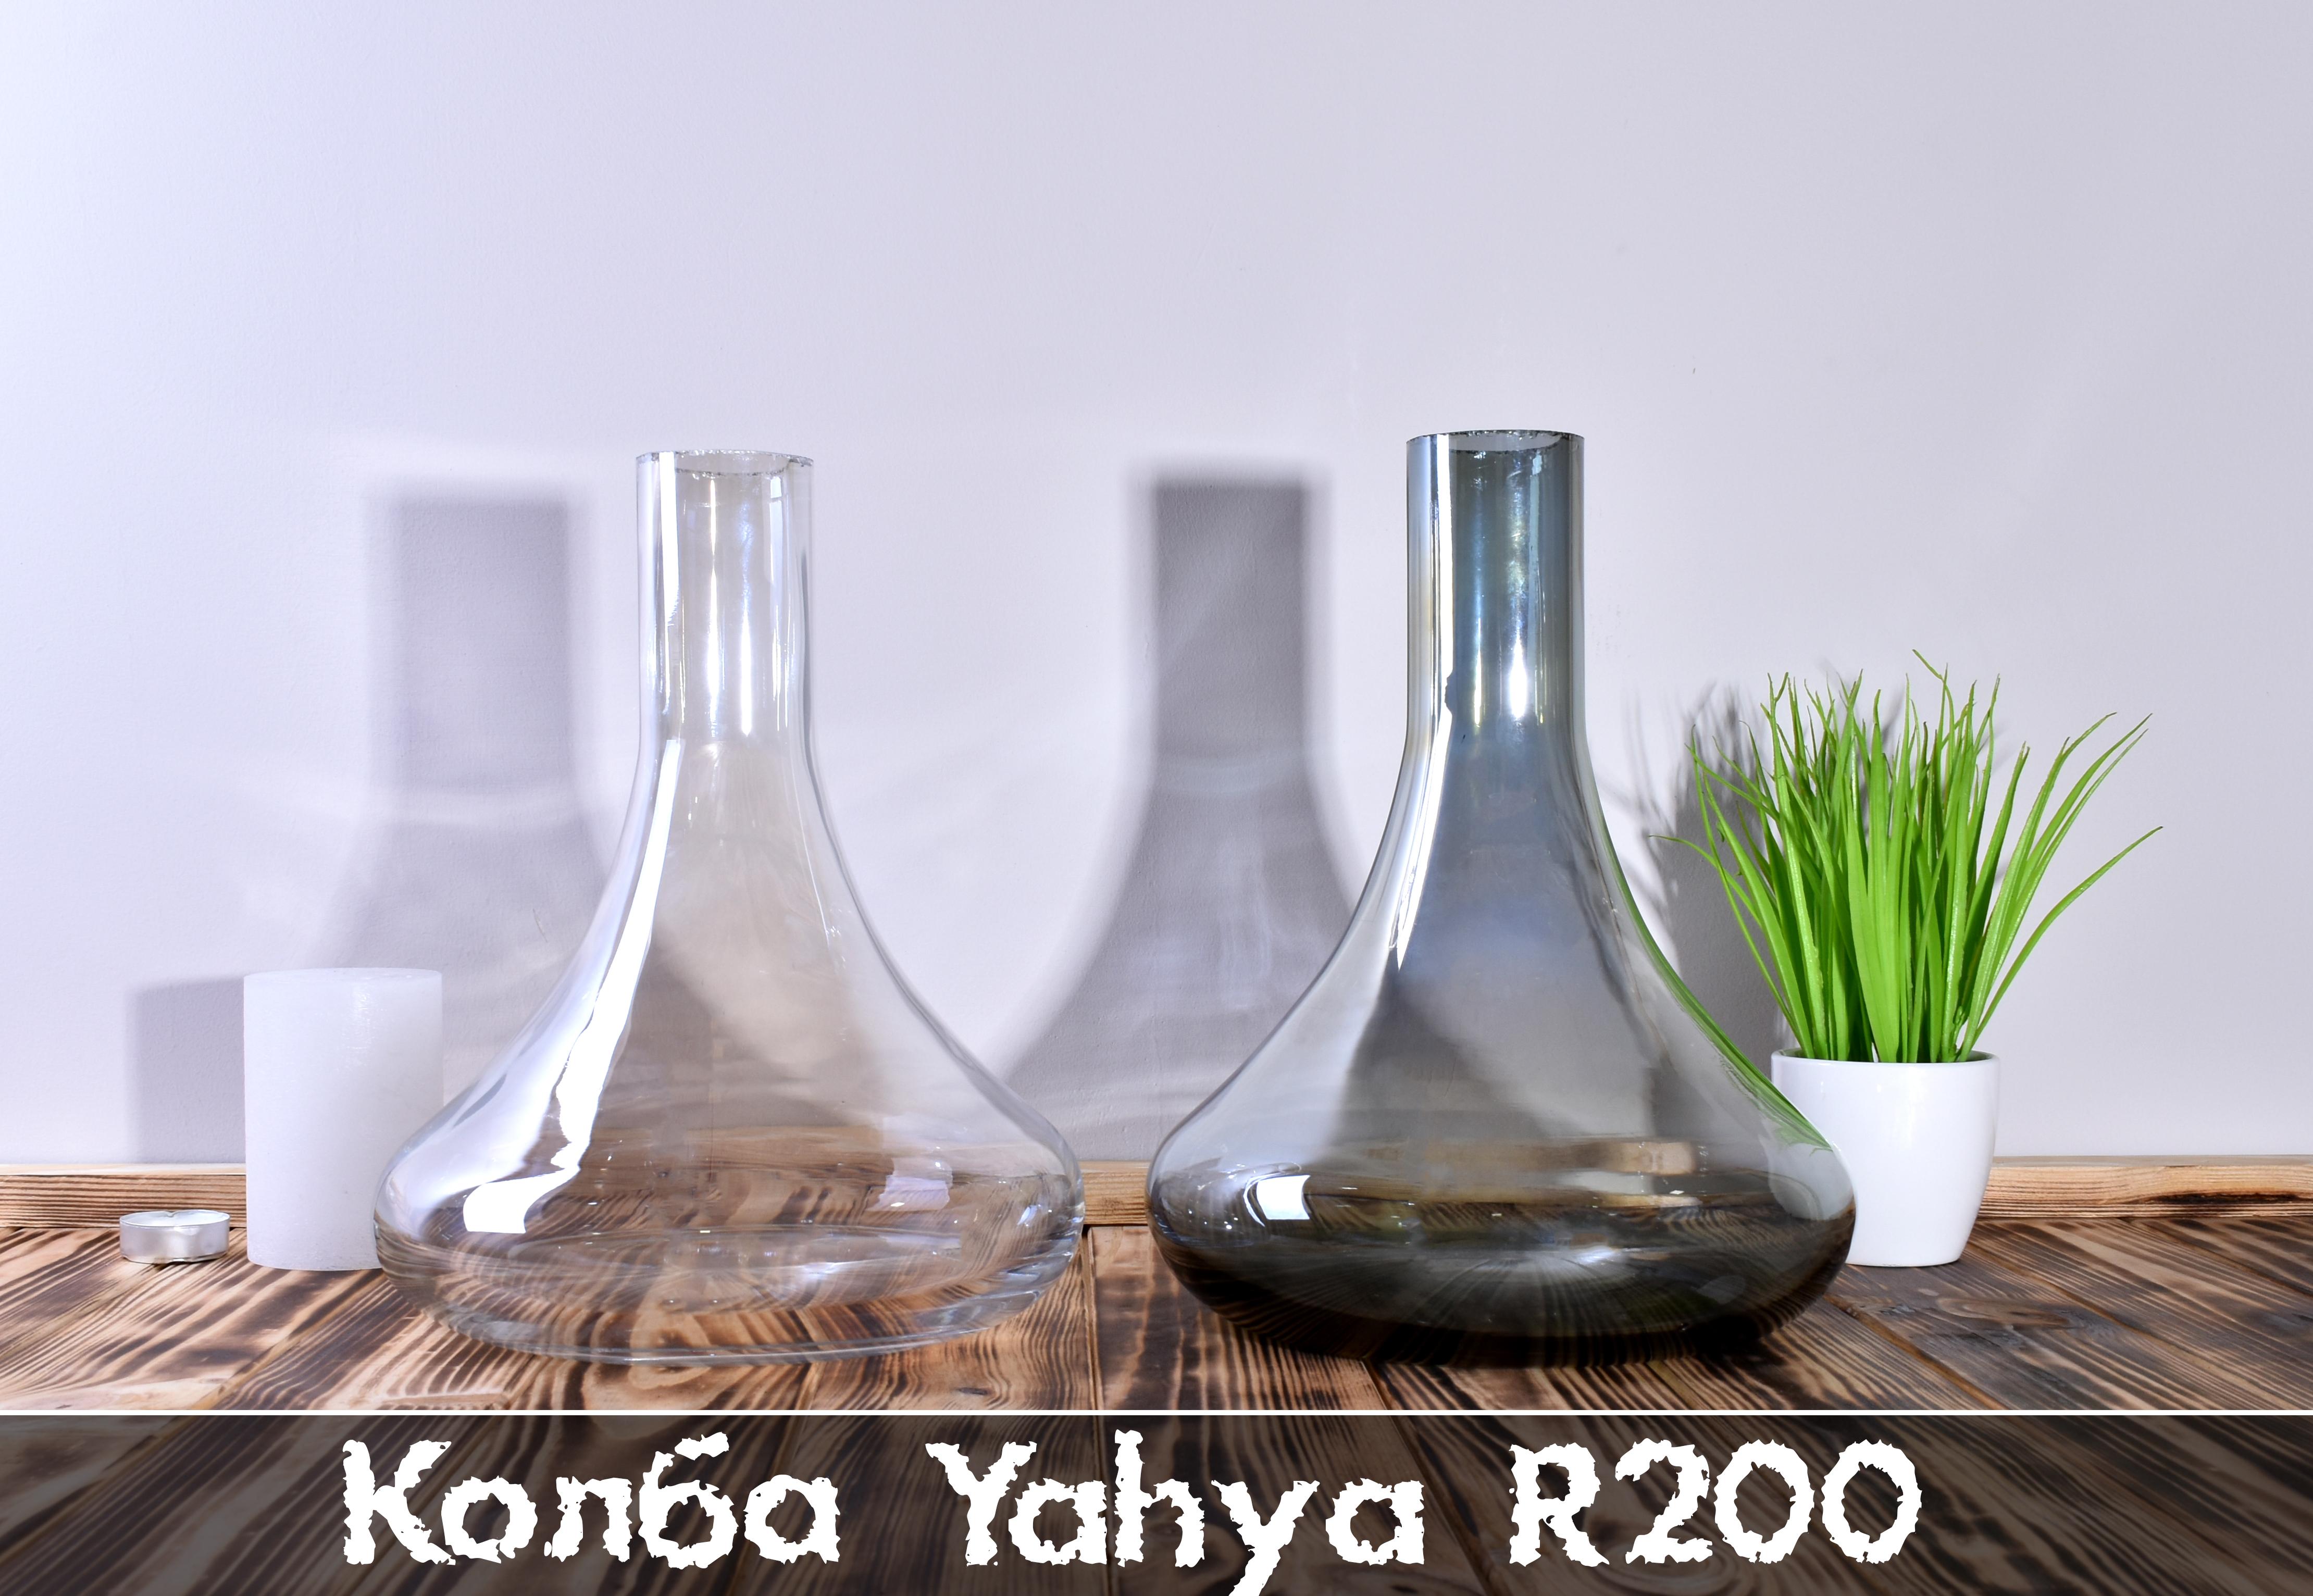 Колба для кальяна Yahya R200 - фото 3 - Kalyanchik.ua